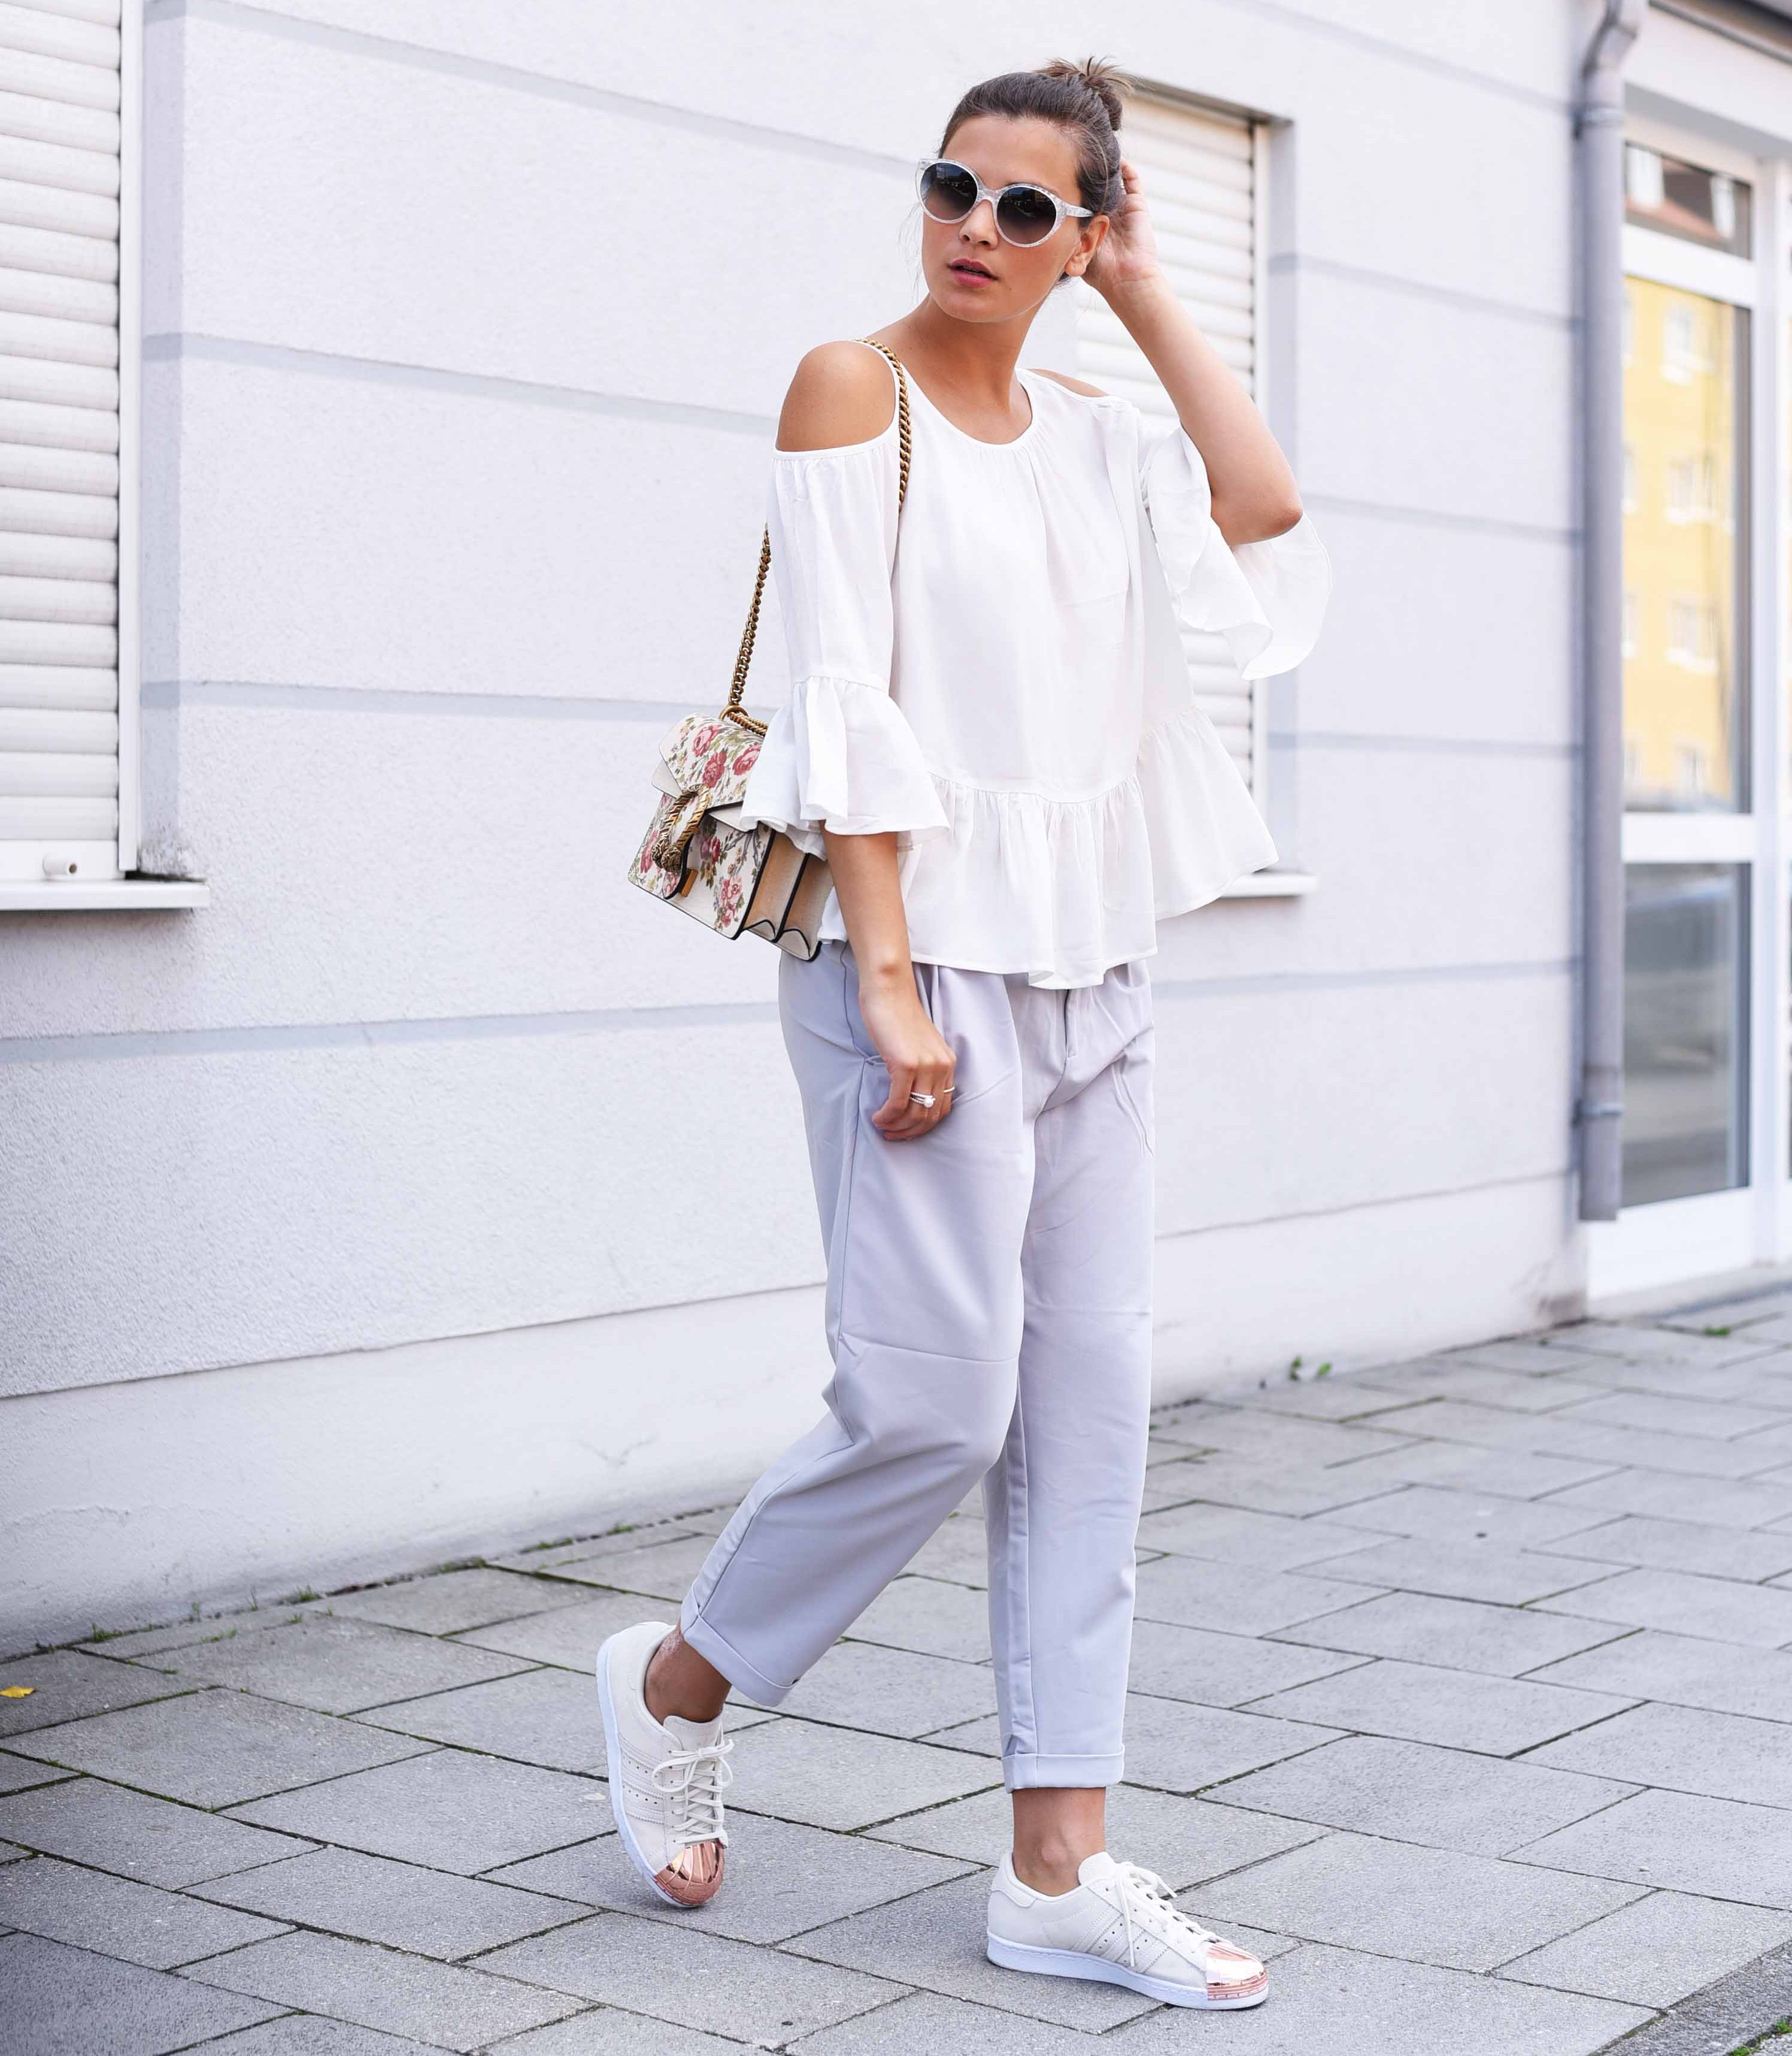 Die besten posen f r fashion blogger lifestyle models for Coole hochbetten fa r teenager